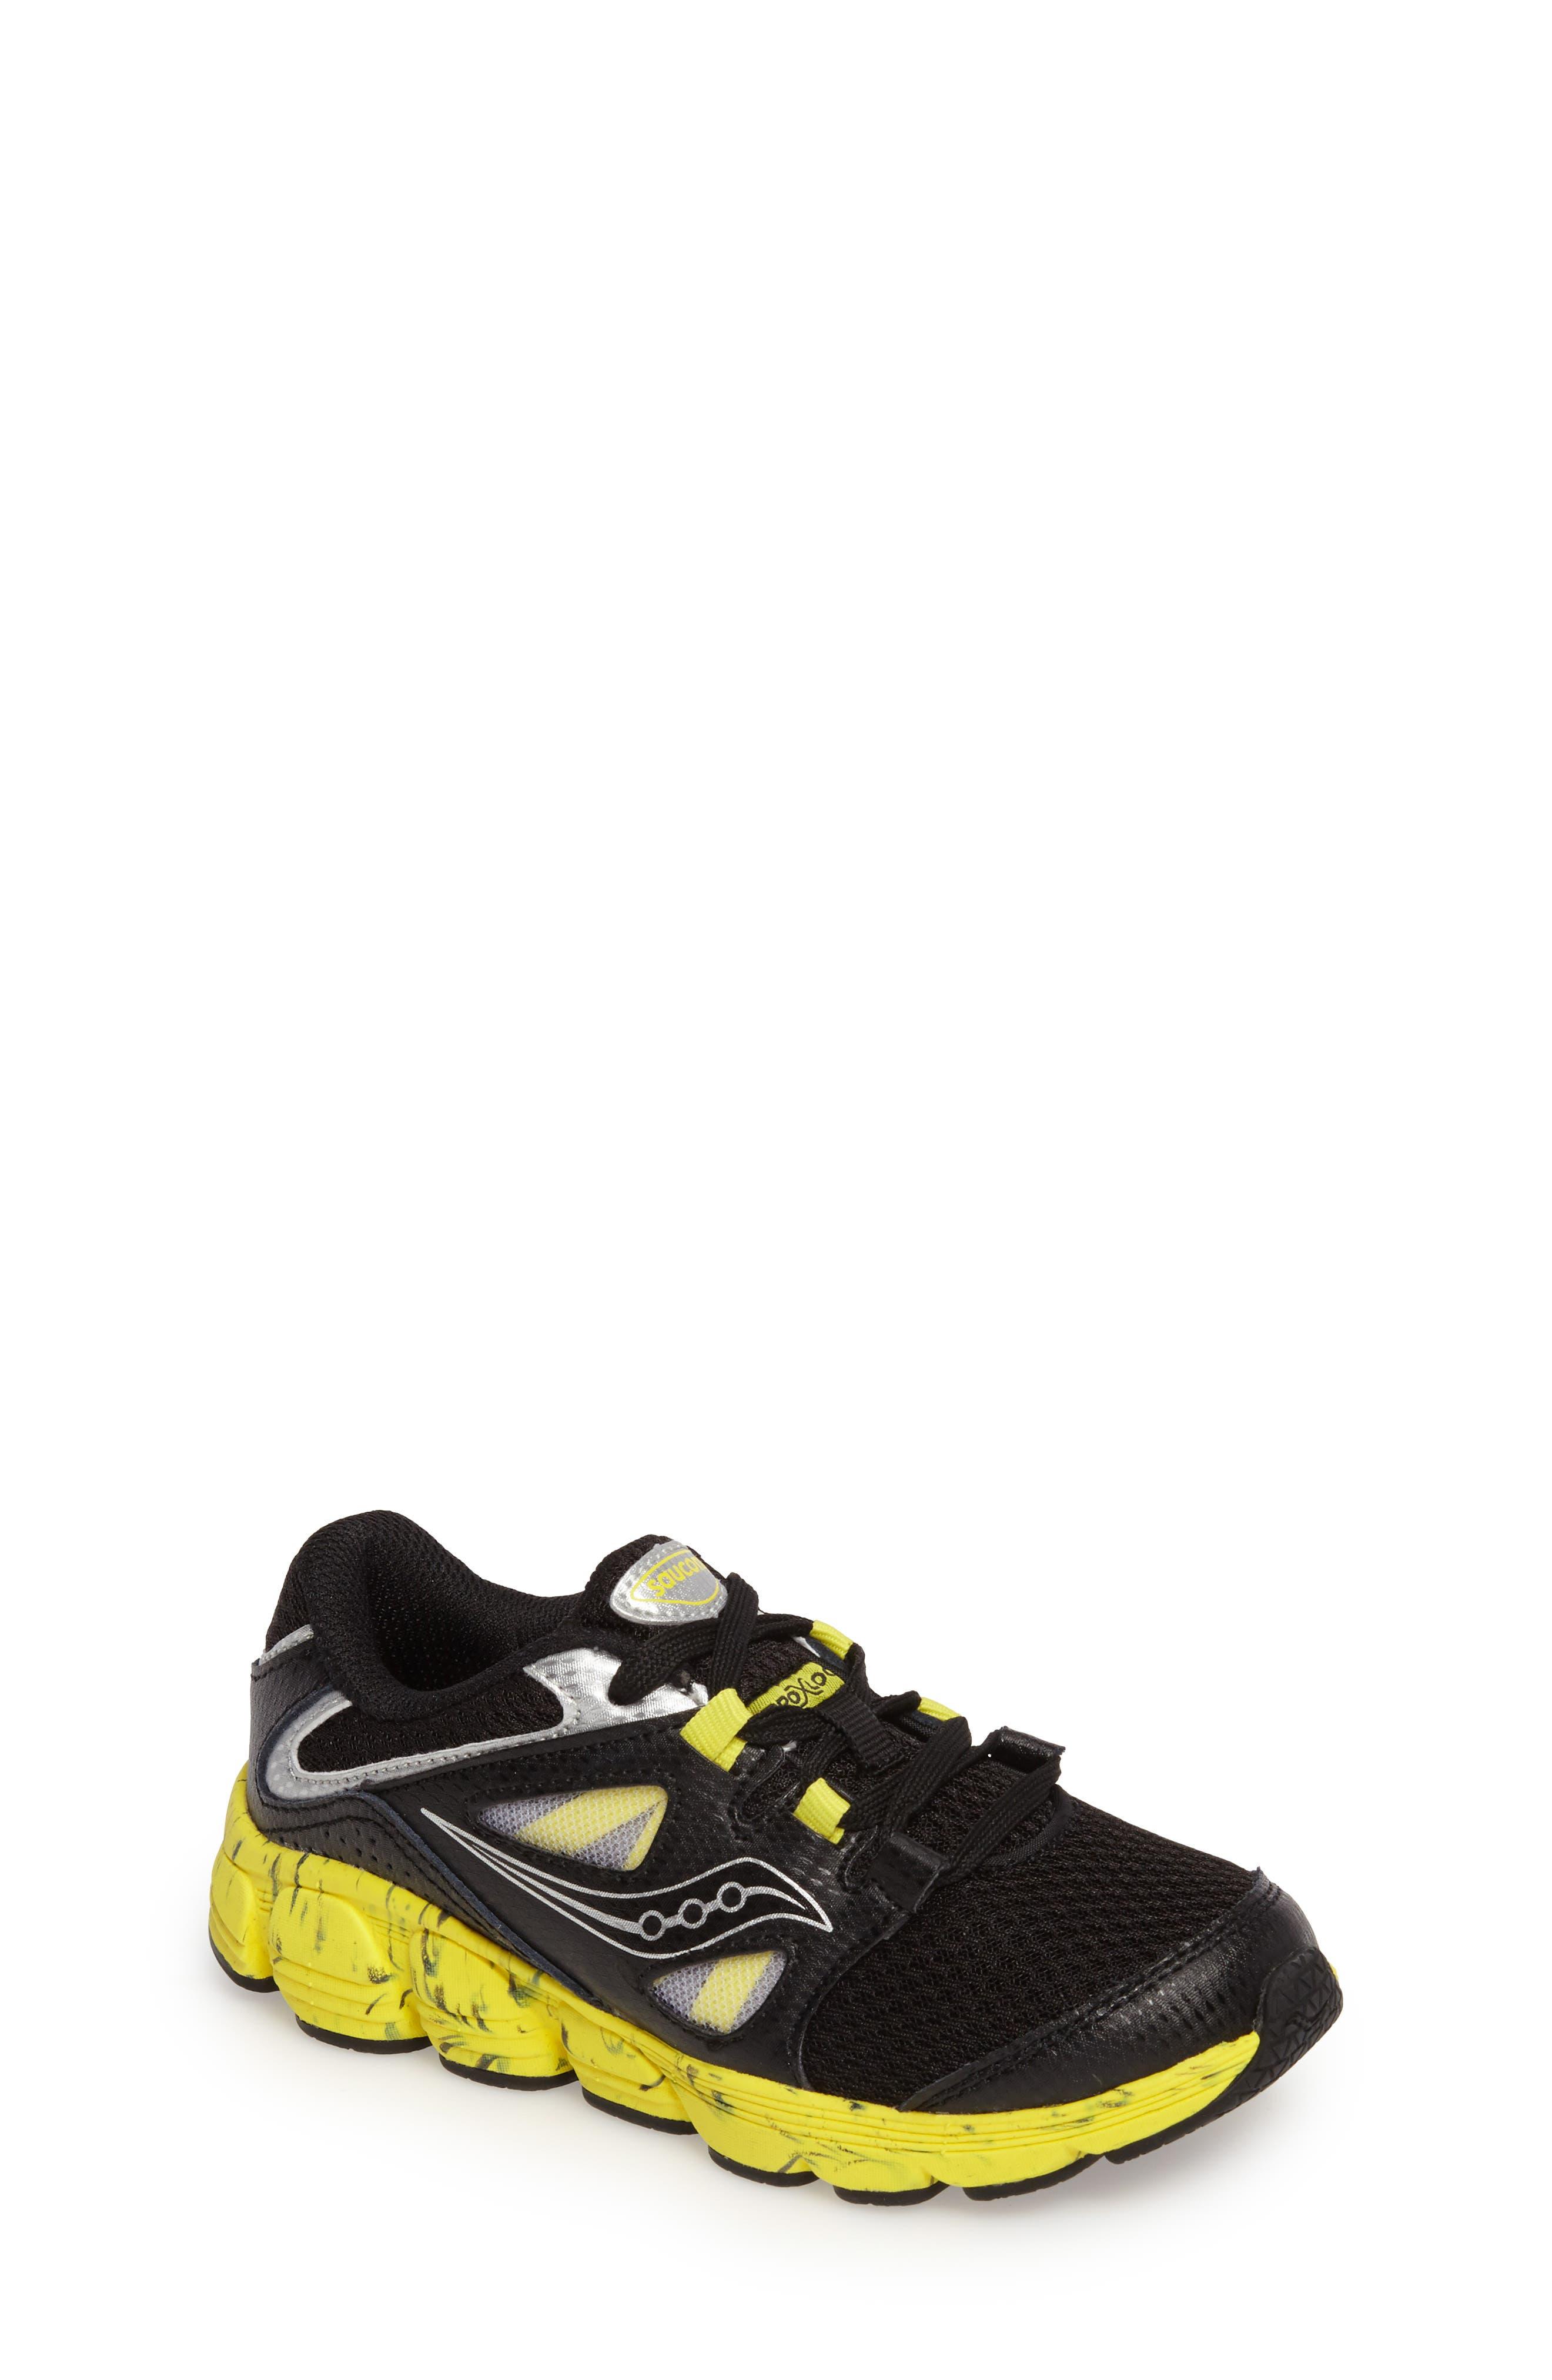 Kotaro 4 Sneaker,                             Main thumbnail 1, color,                             001